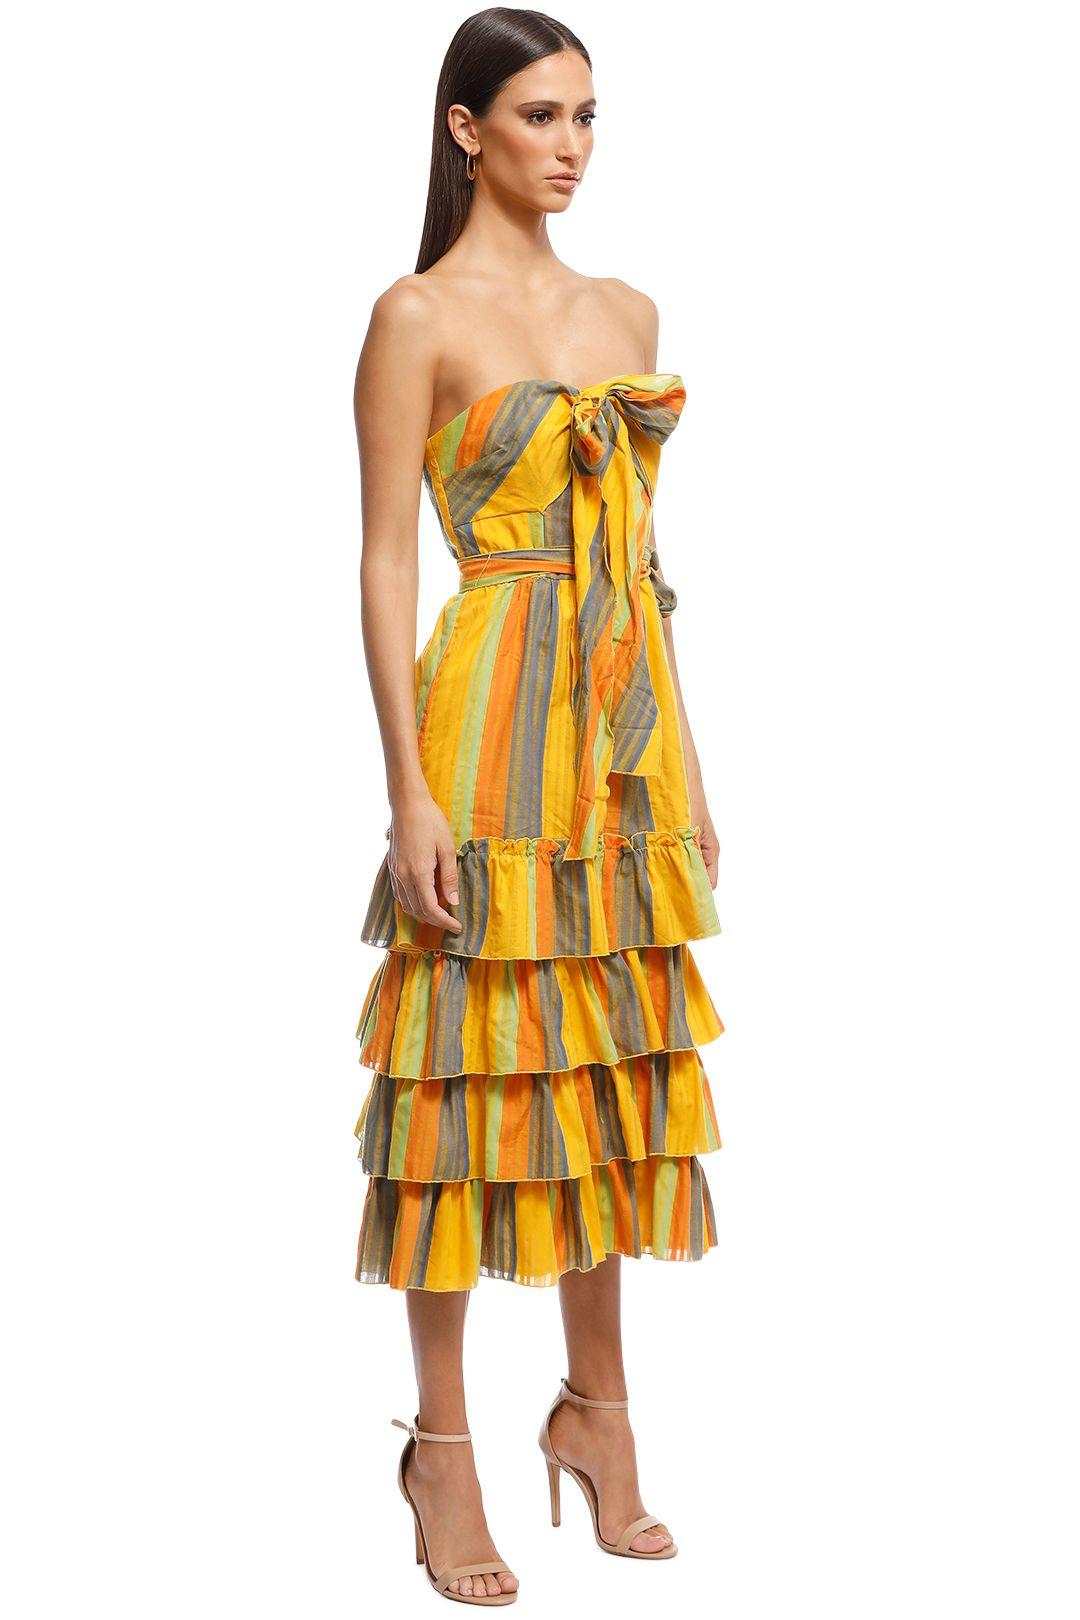 Talulah - Imperial Midi Dress - Yellow Stripes - Side